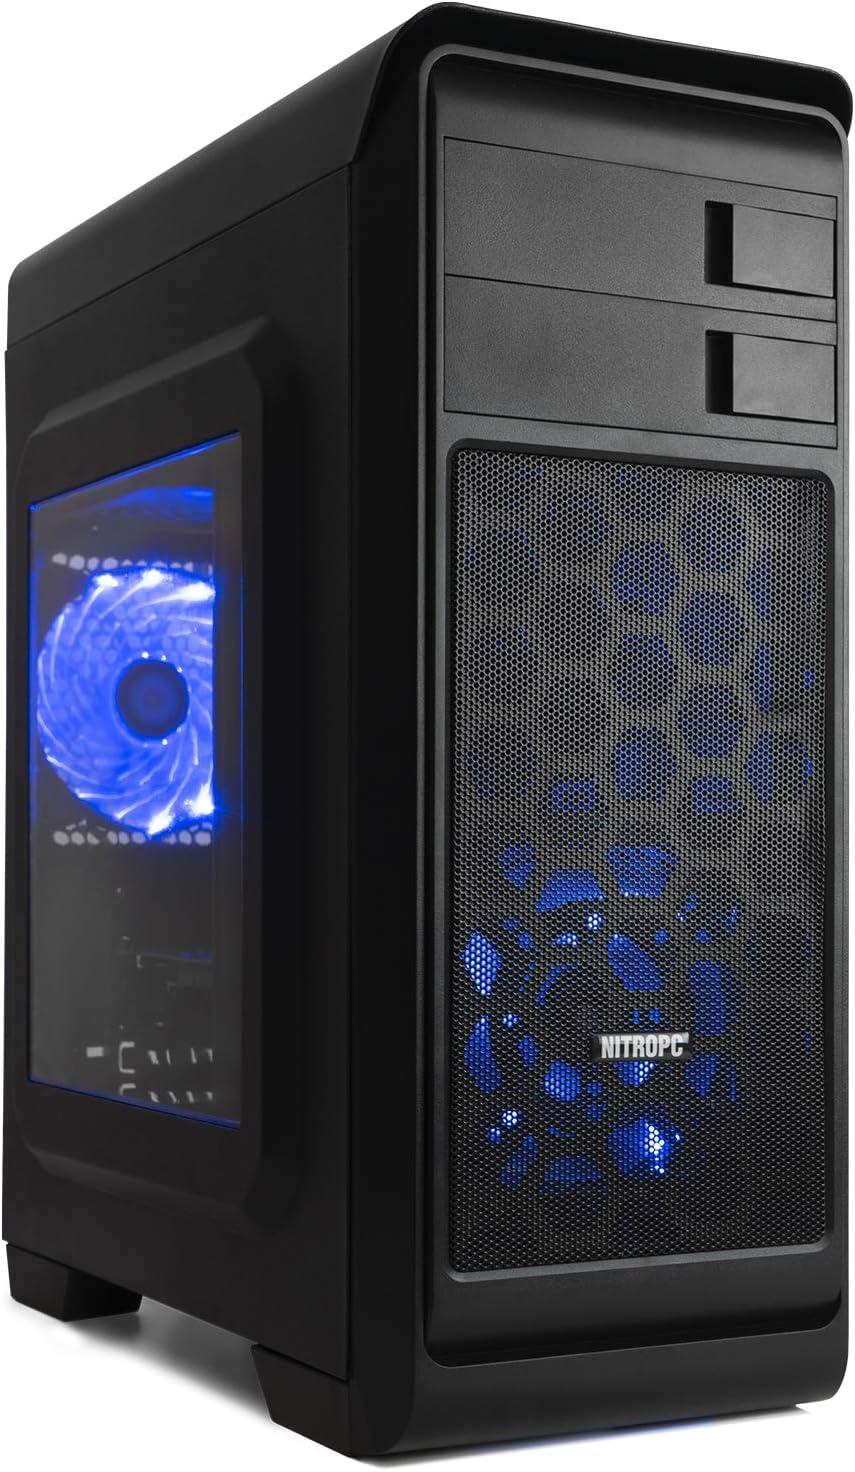 NITROPC - PC Gamer VX *Rebajas de marzo 2020* (CPU Ryzen, 4 x 3,40Ghz, T. Gráfica Nvidia GTX 1650 4GB, SSD 240GB, Hdd 1TB, Ram 16GB) + WIFI de regalo. pc gamer, pc gaming, pc para juegos, ordenador ju